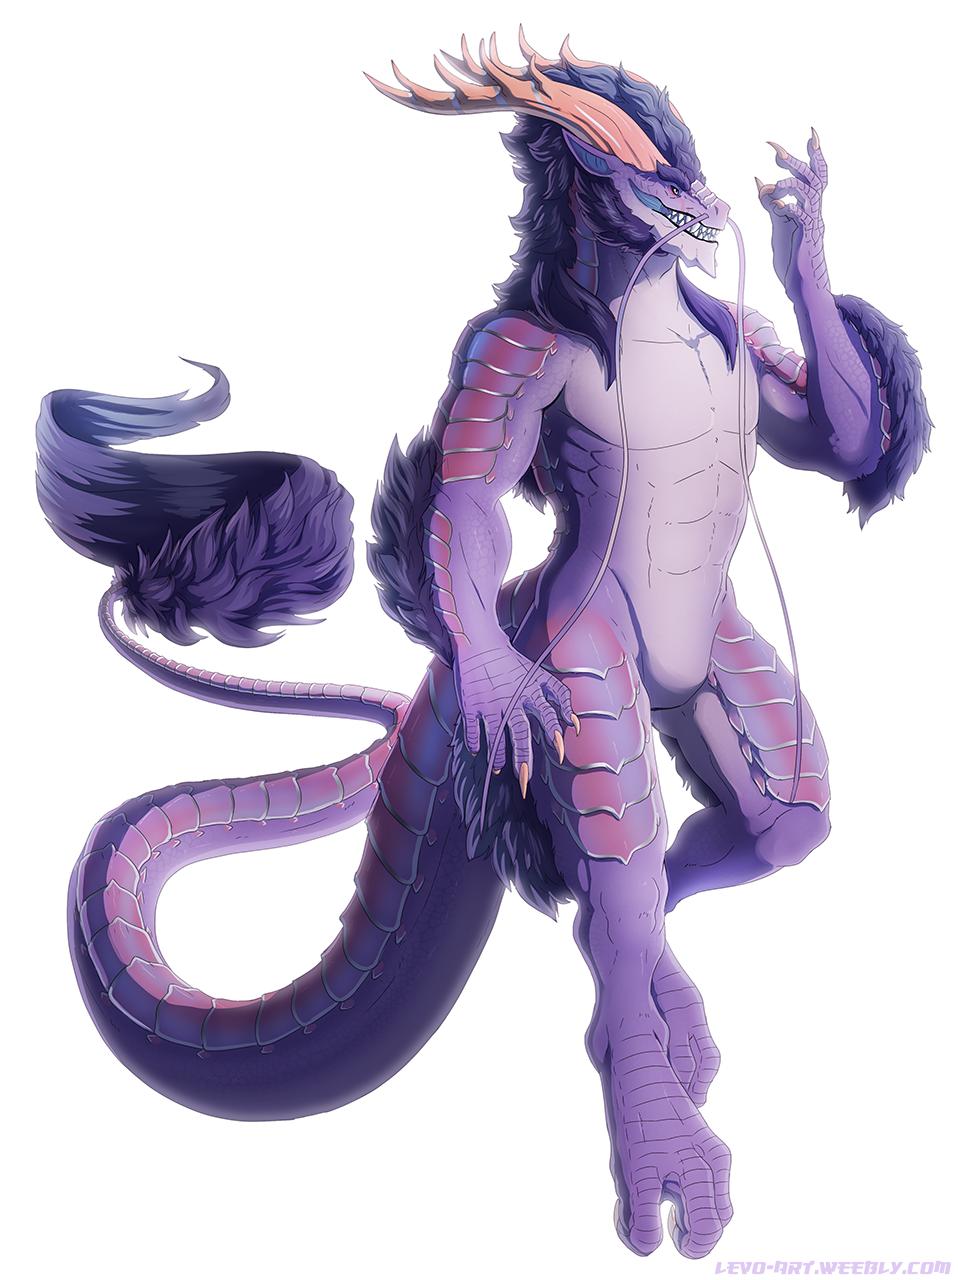 Moodboard - Eastern Dragon